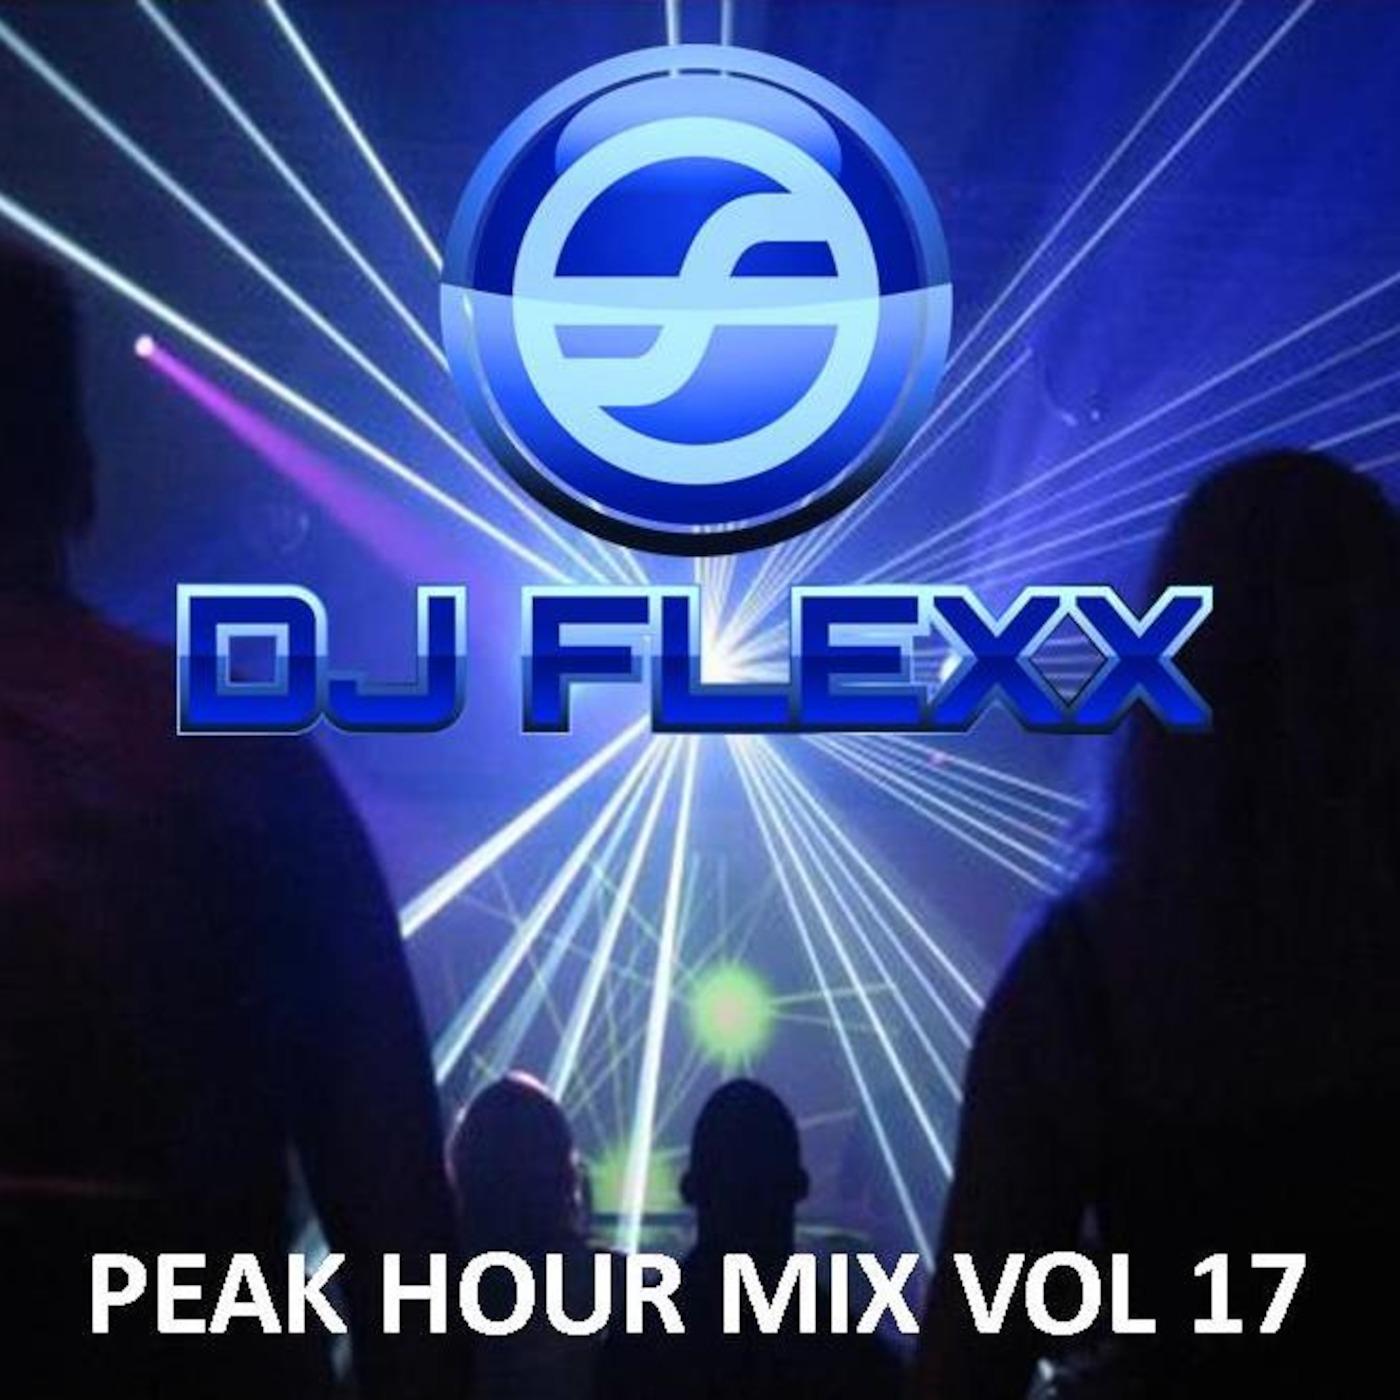 DJ Flexx - Peak Hour Mix Vol  17 (02-27-14) FLEXX's Podcasts